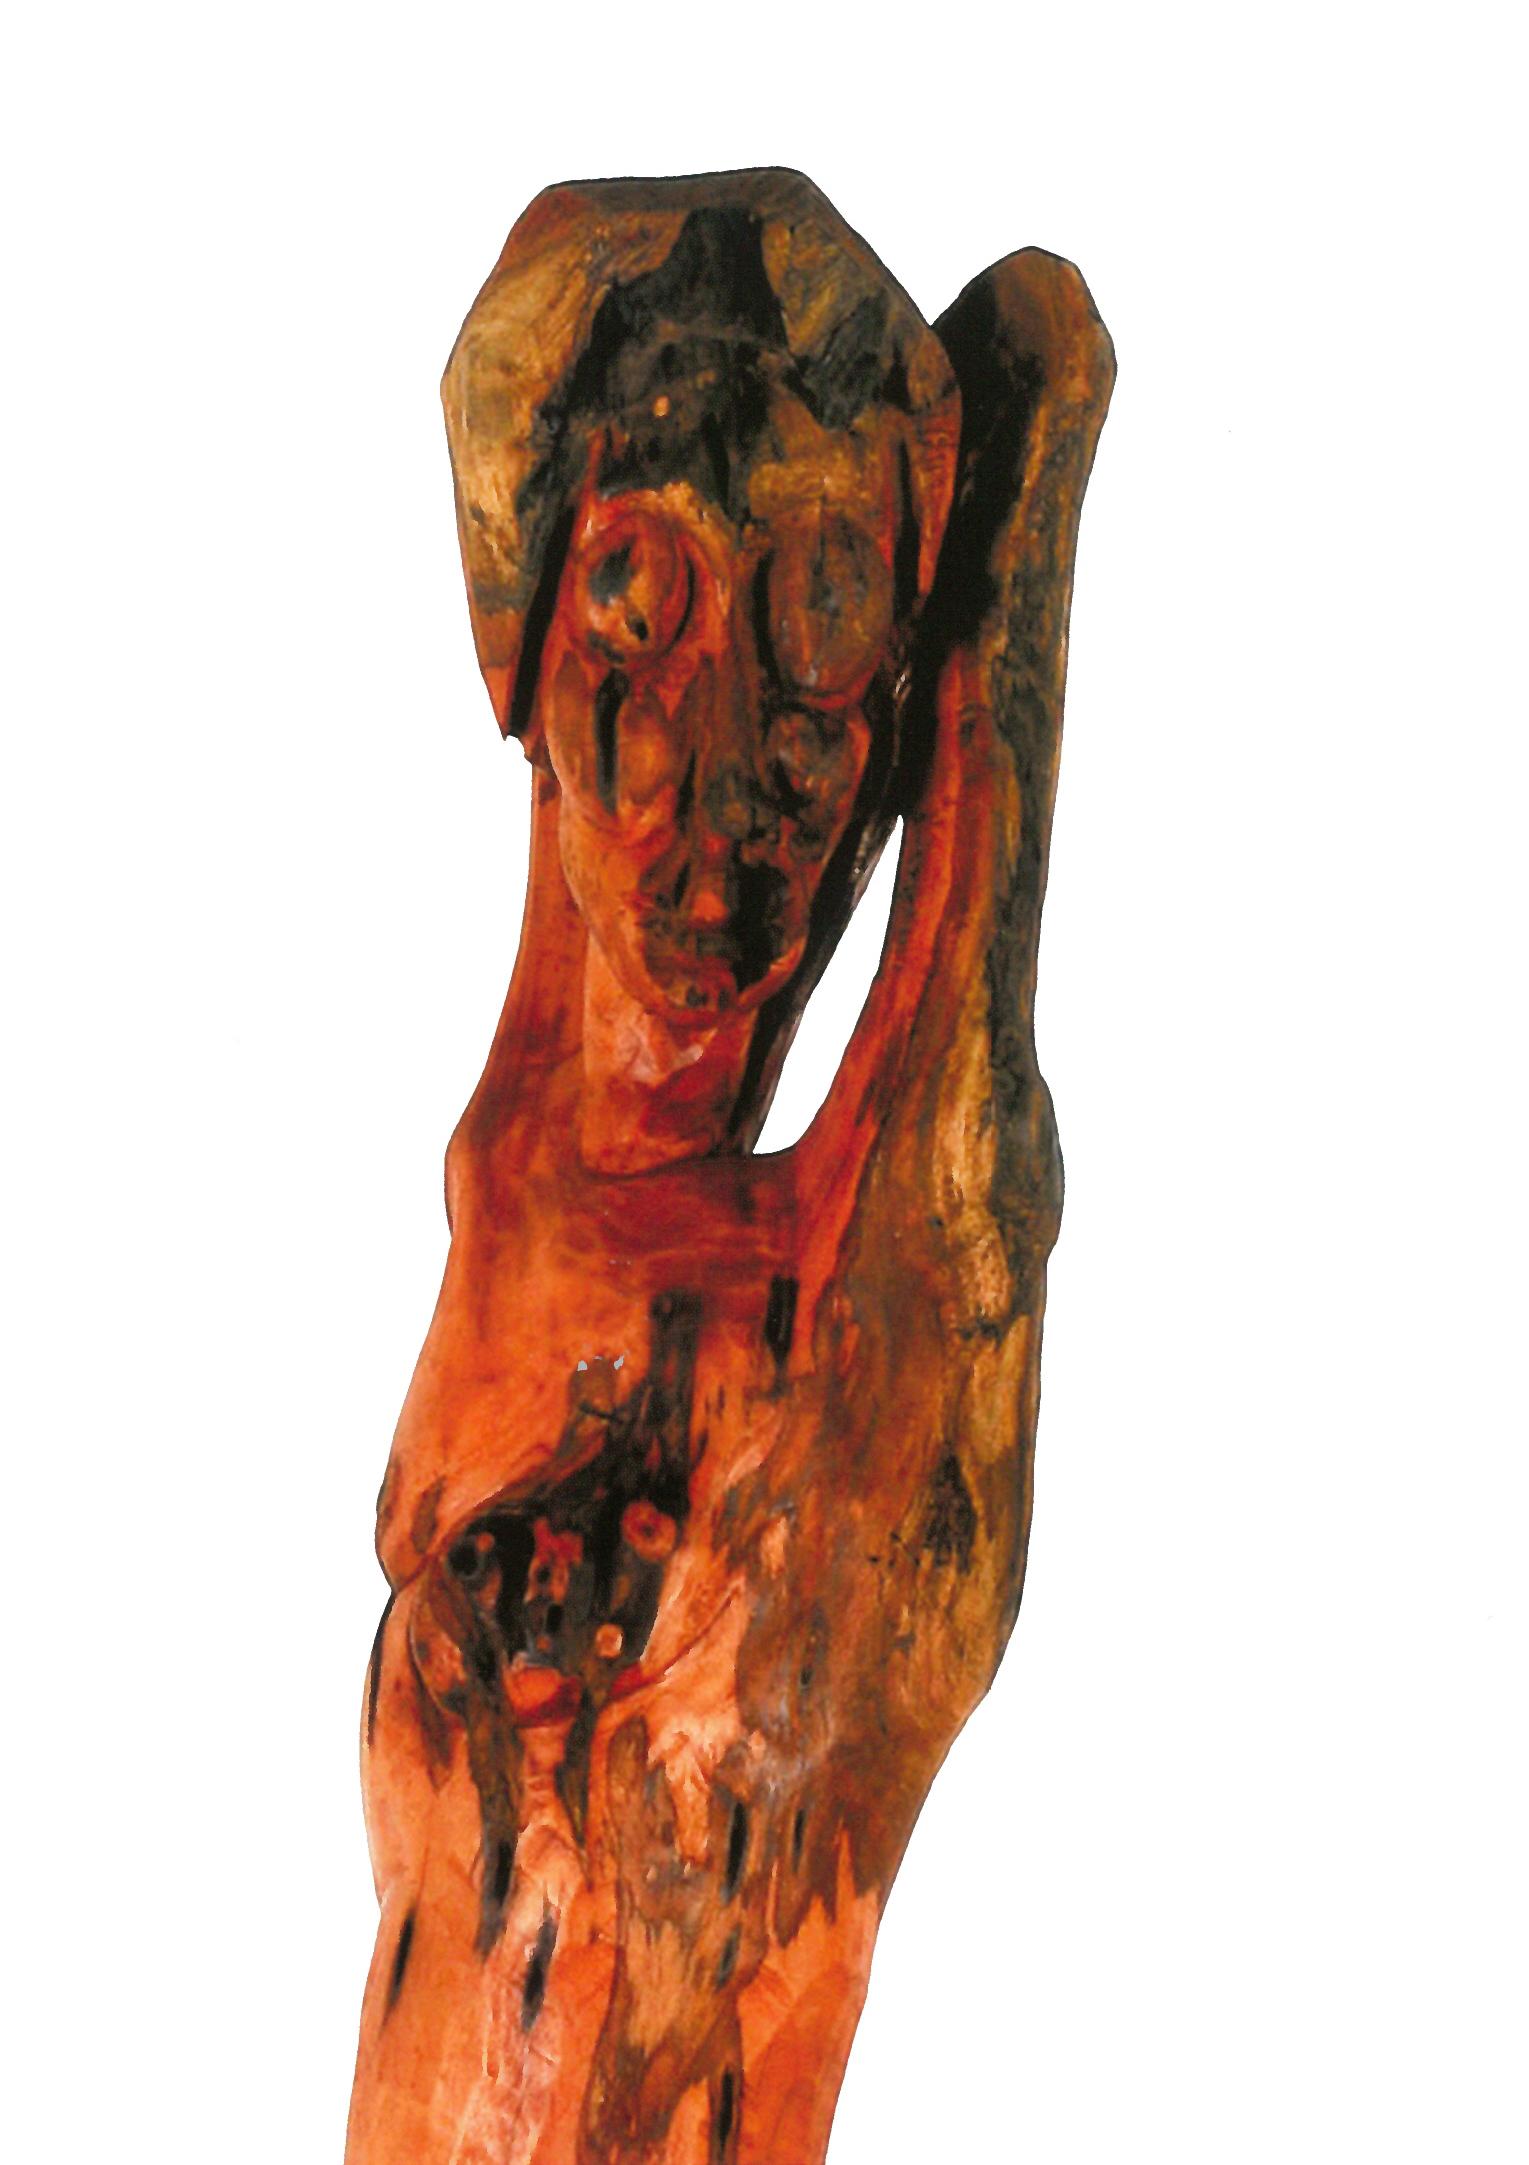 Antonius Roberts_La Femme de Lyford Cay (detail)_2006_Recycled Madeira_72%22.jpg